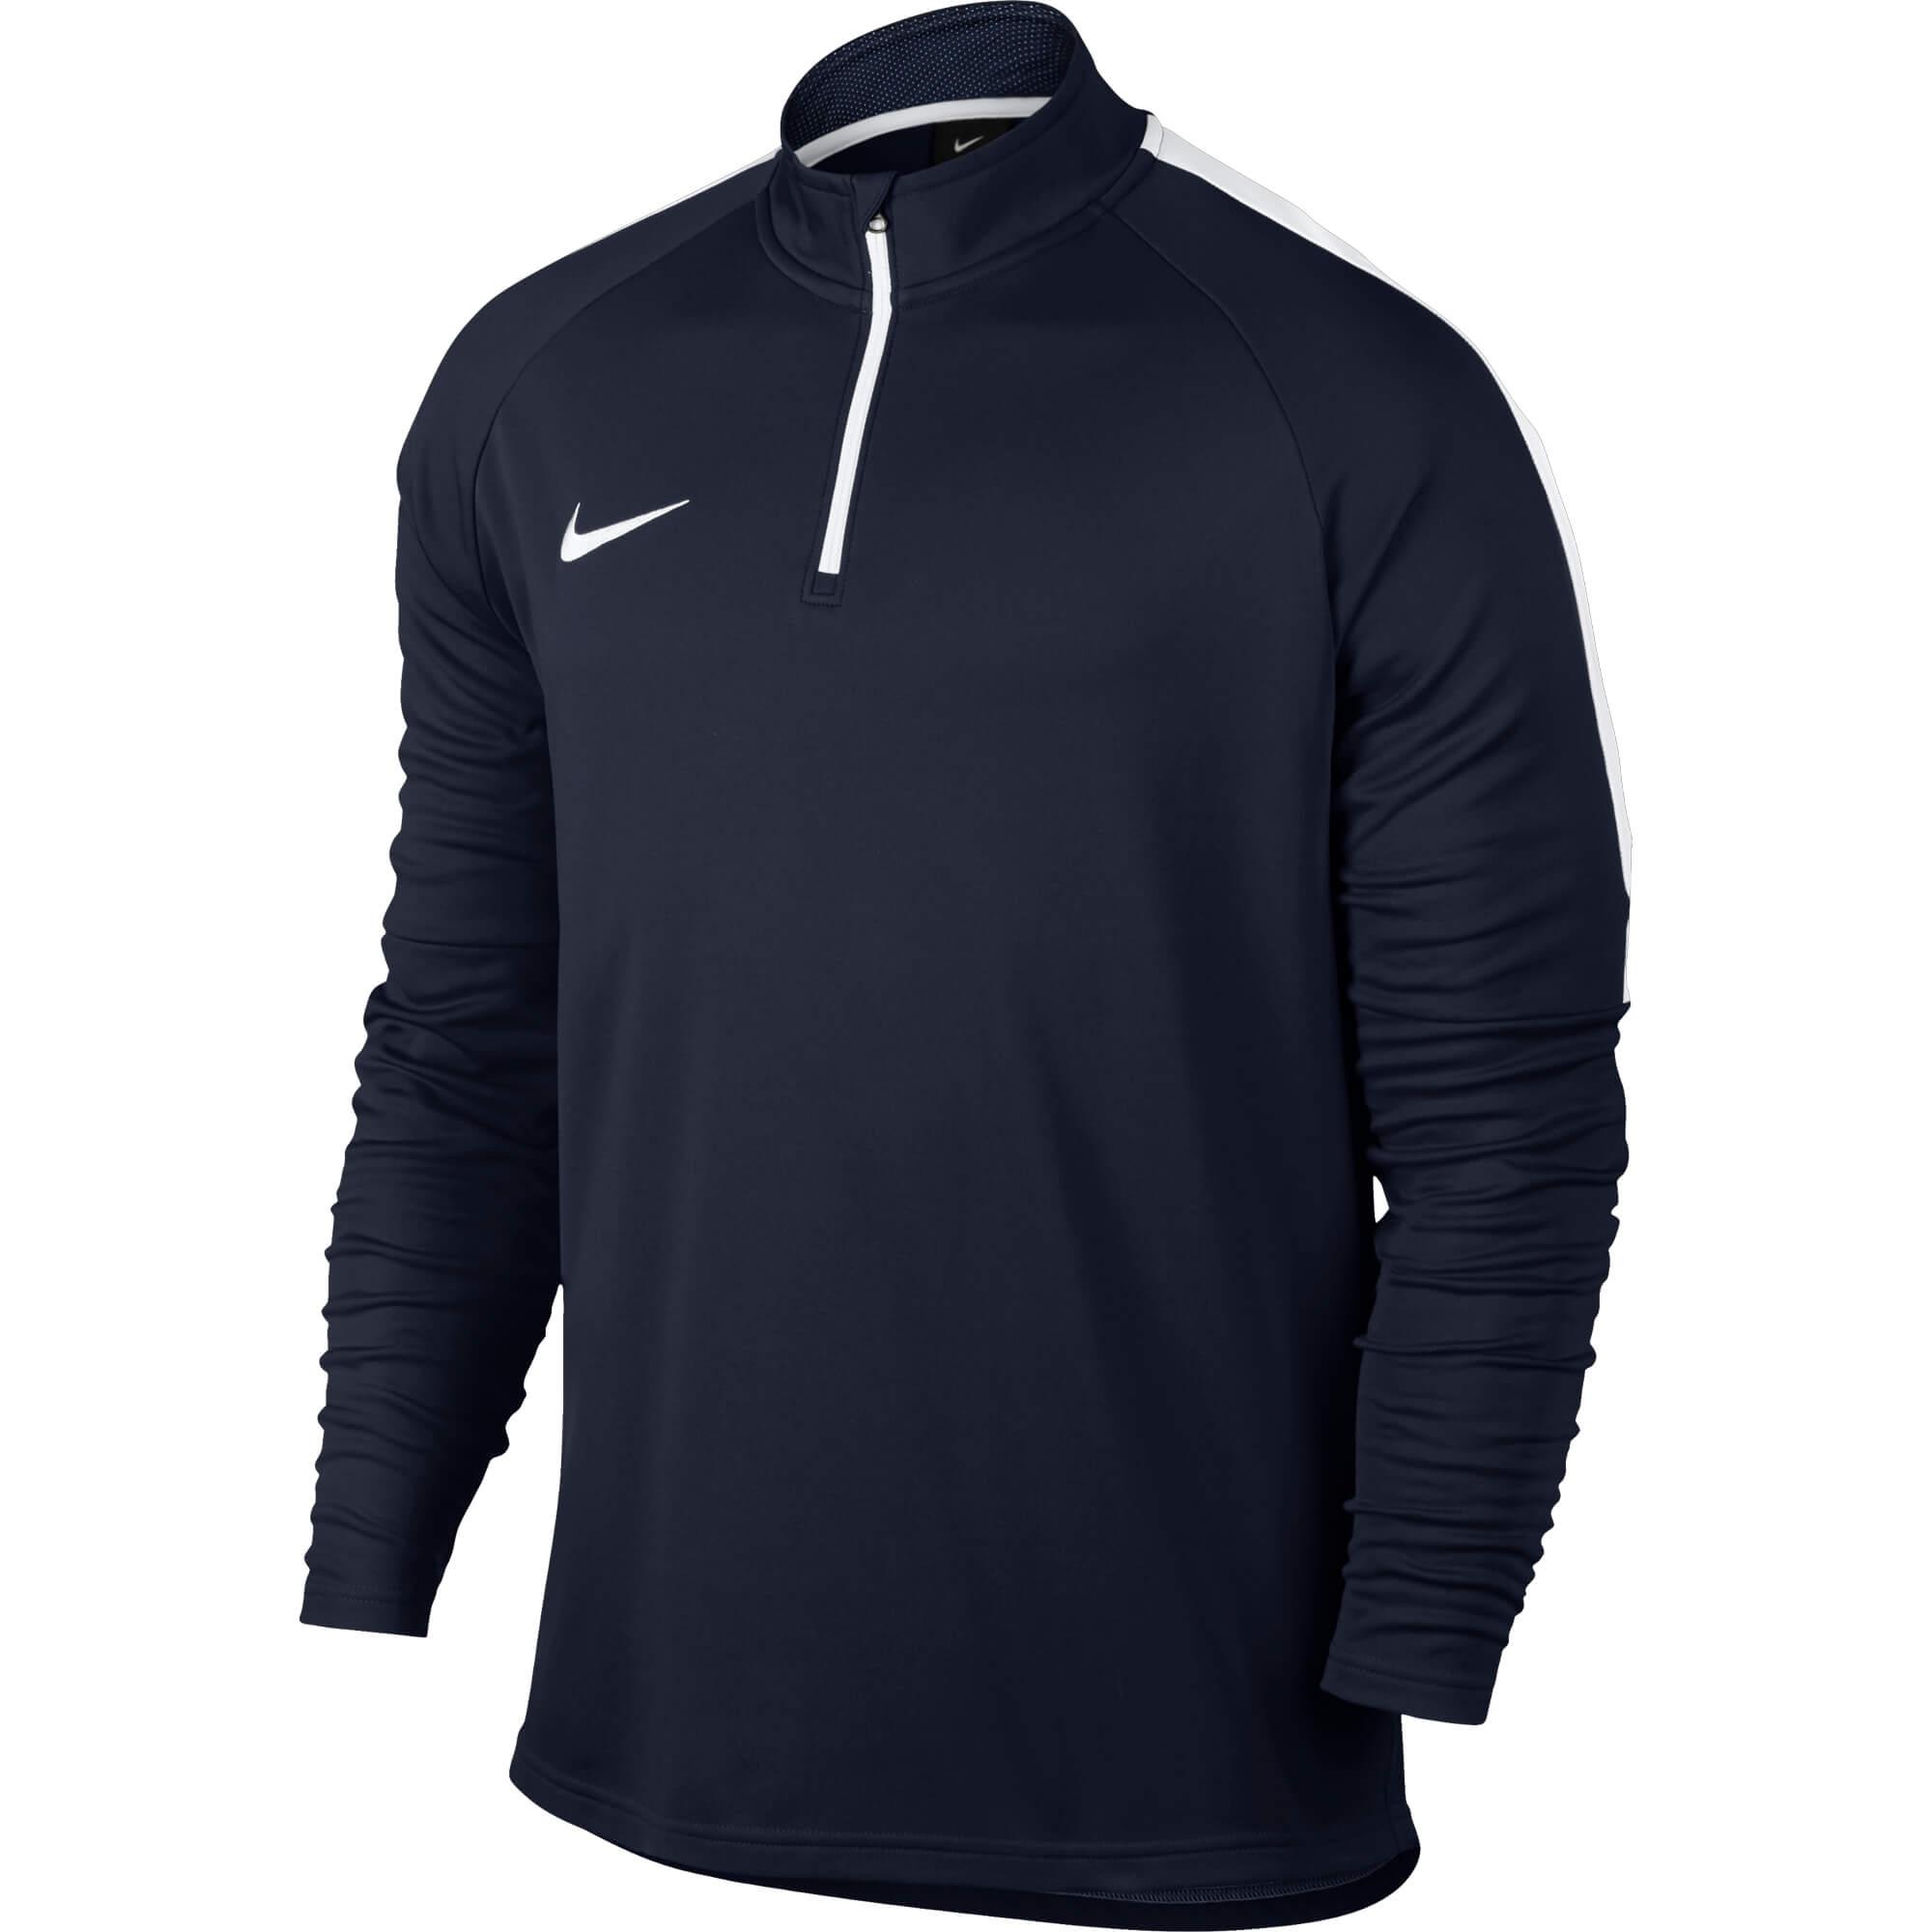 1681219f28 Nike Moški pulover Dry Drill Temno modra - Ceneje.si